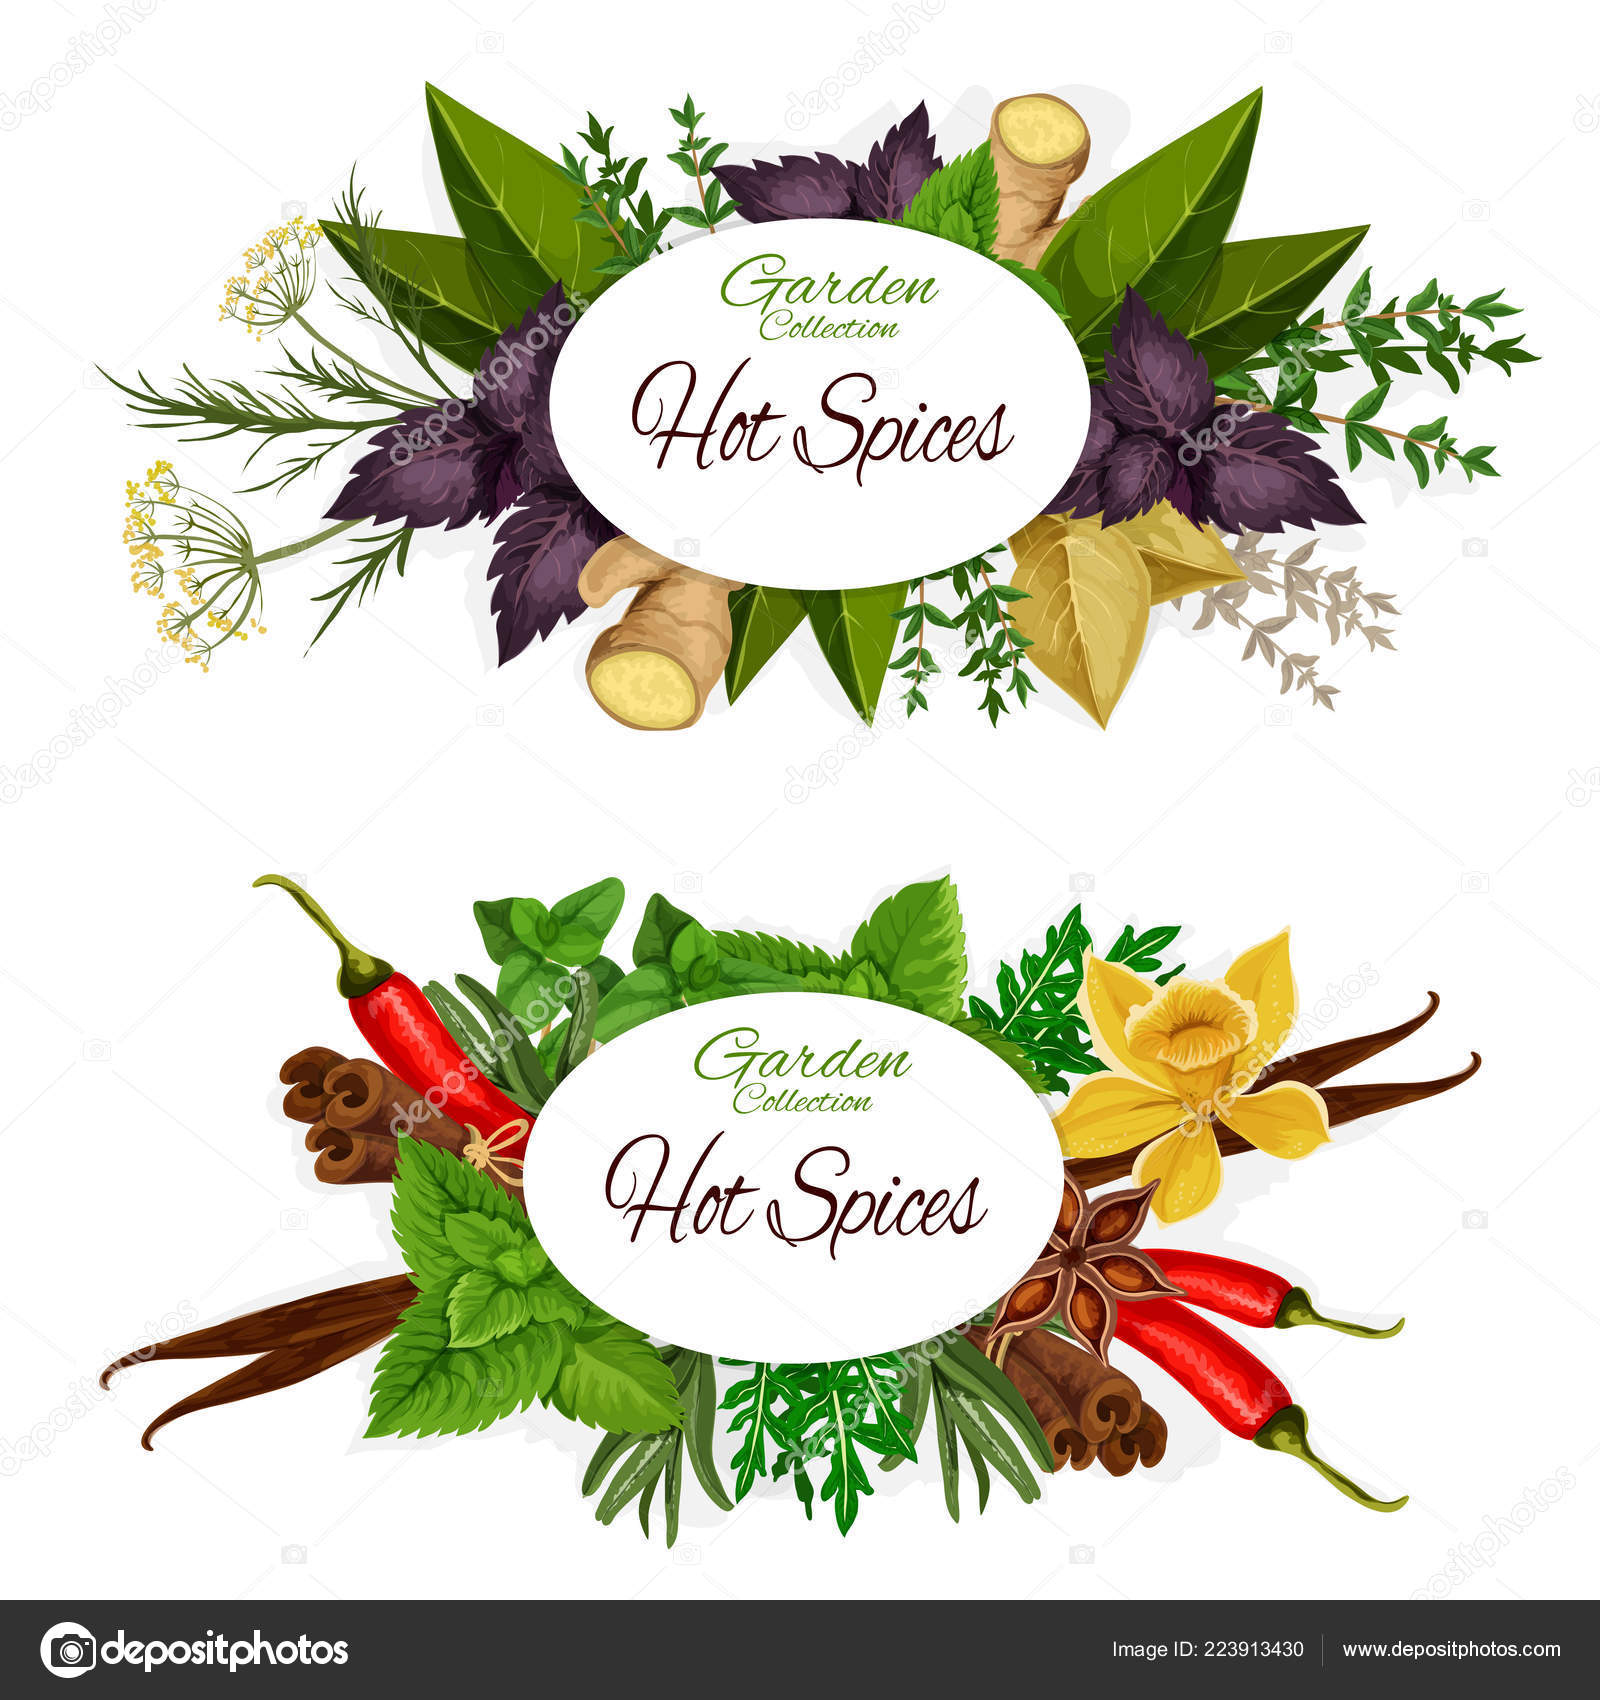 kitchen herb kit medallion cabinets 草药和热香料 调味料横幅 图库矢量图像 c seamartini 223913430 图库矢量图片